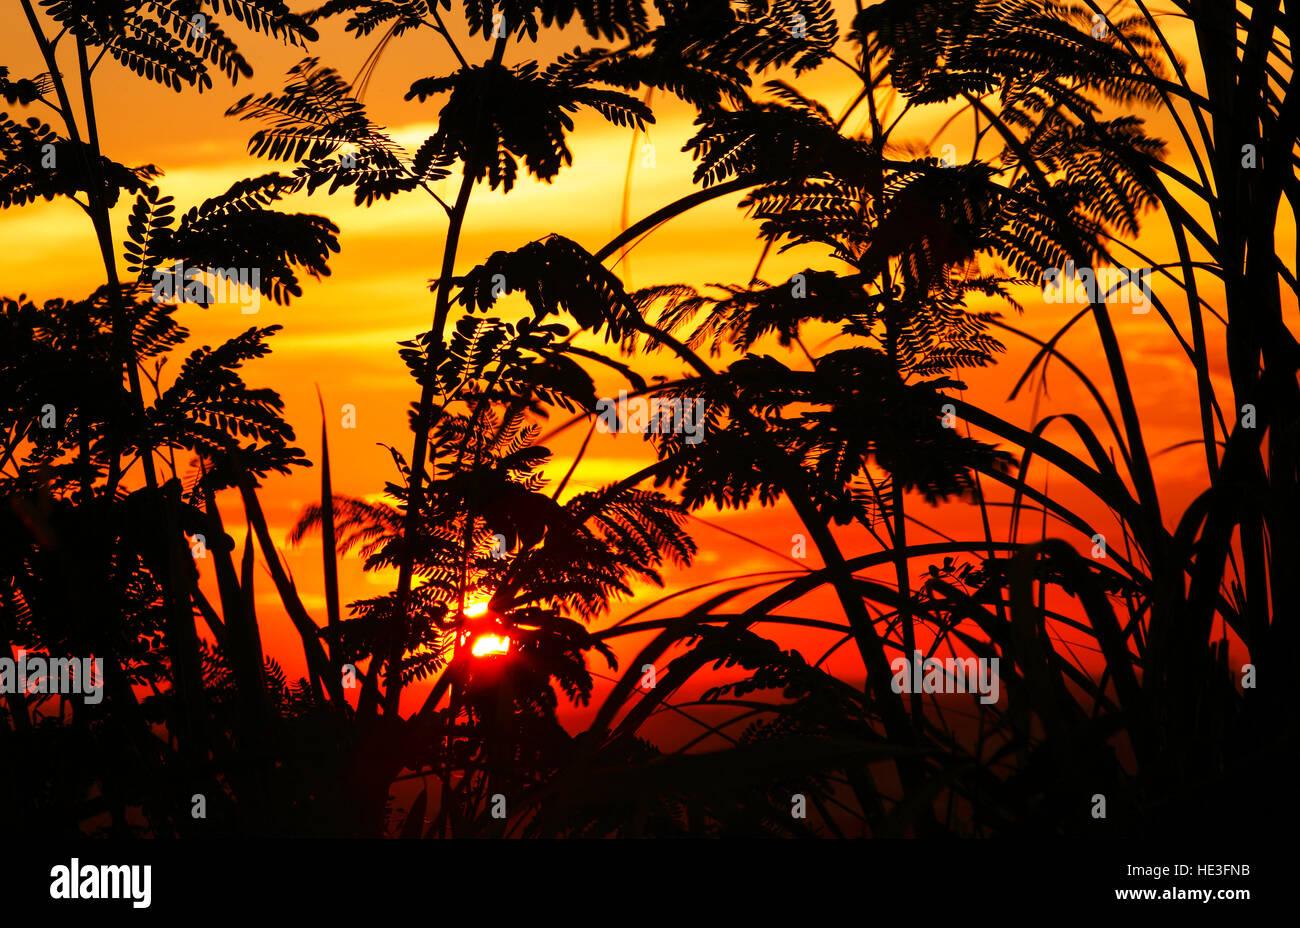 Sonnenuntergang Silhouette in Puchong, Malaysia. Stockbild